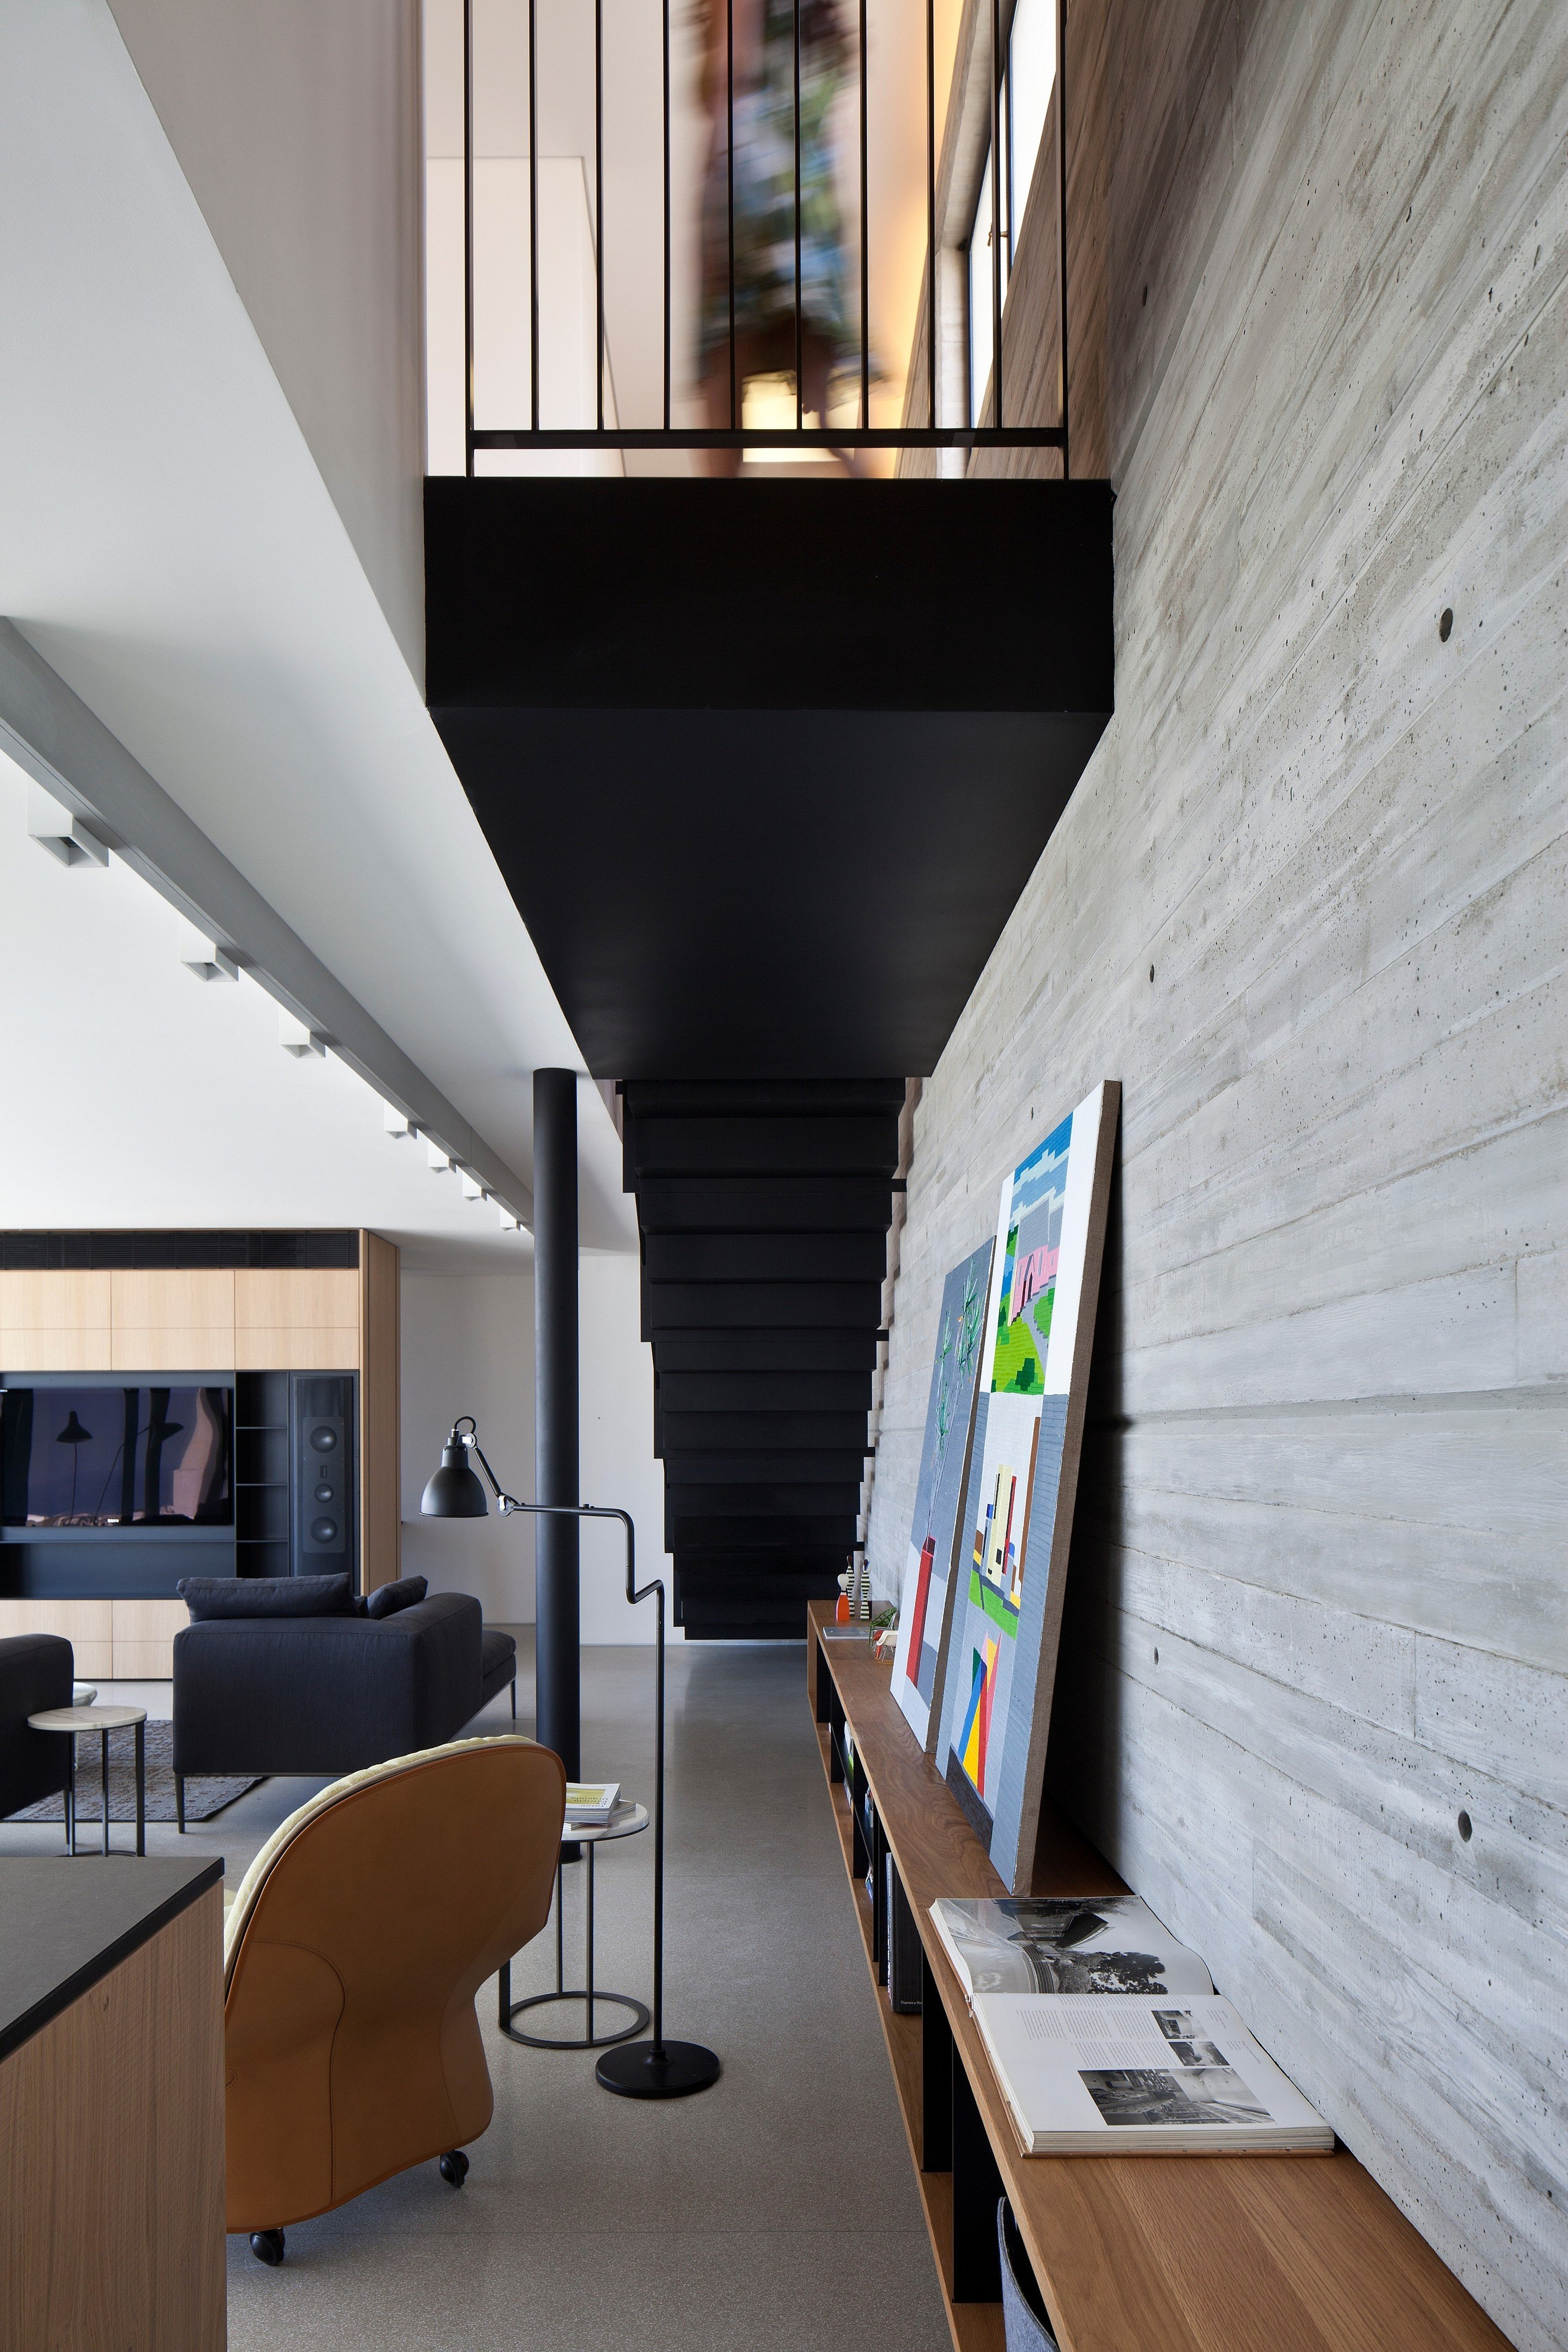 Idee Renovation Salon y duplex penthouse | pitsou kedem architects